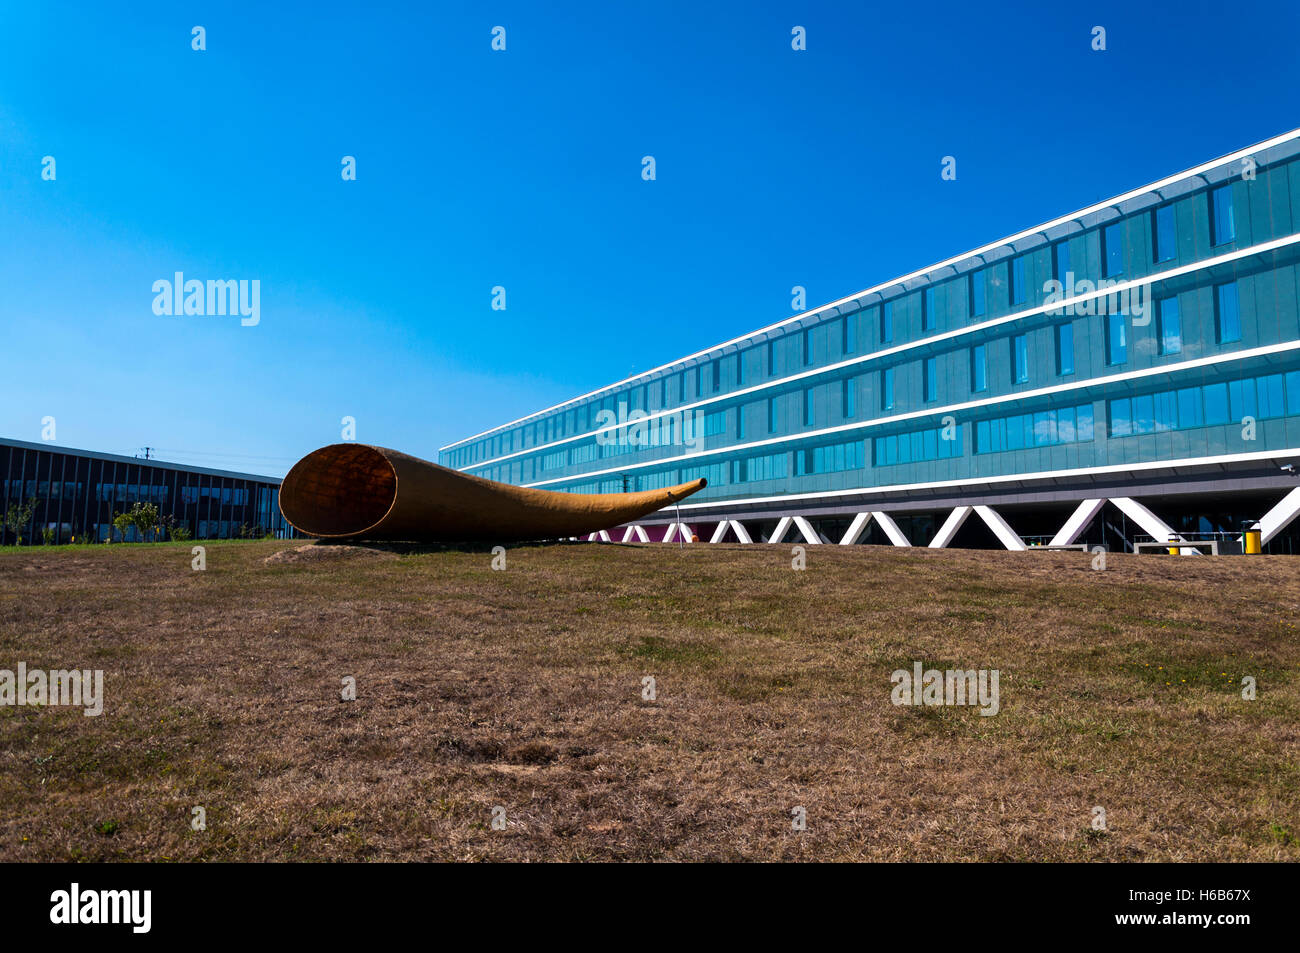 Bizkaiko Campusa, Universidad del Pais Vasco. Bilbao University campus, Spain - Stock Image